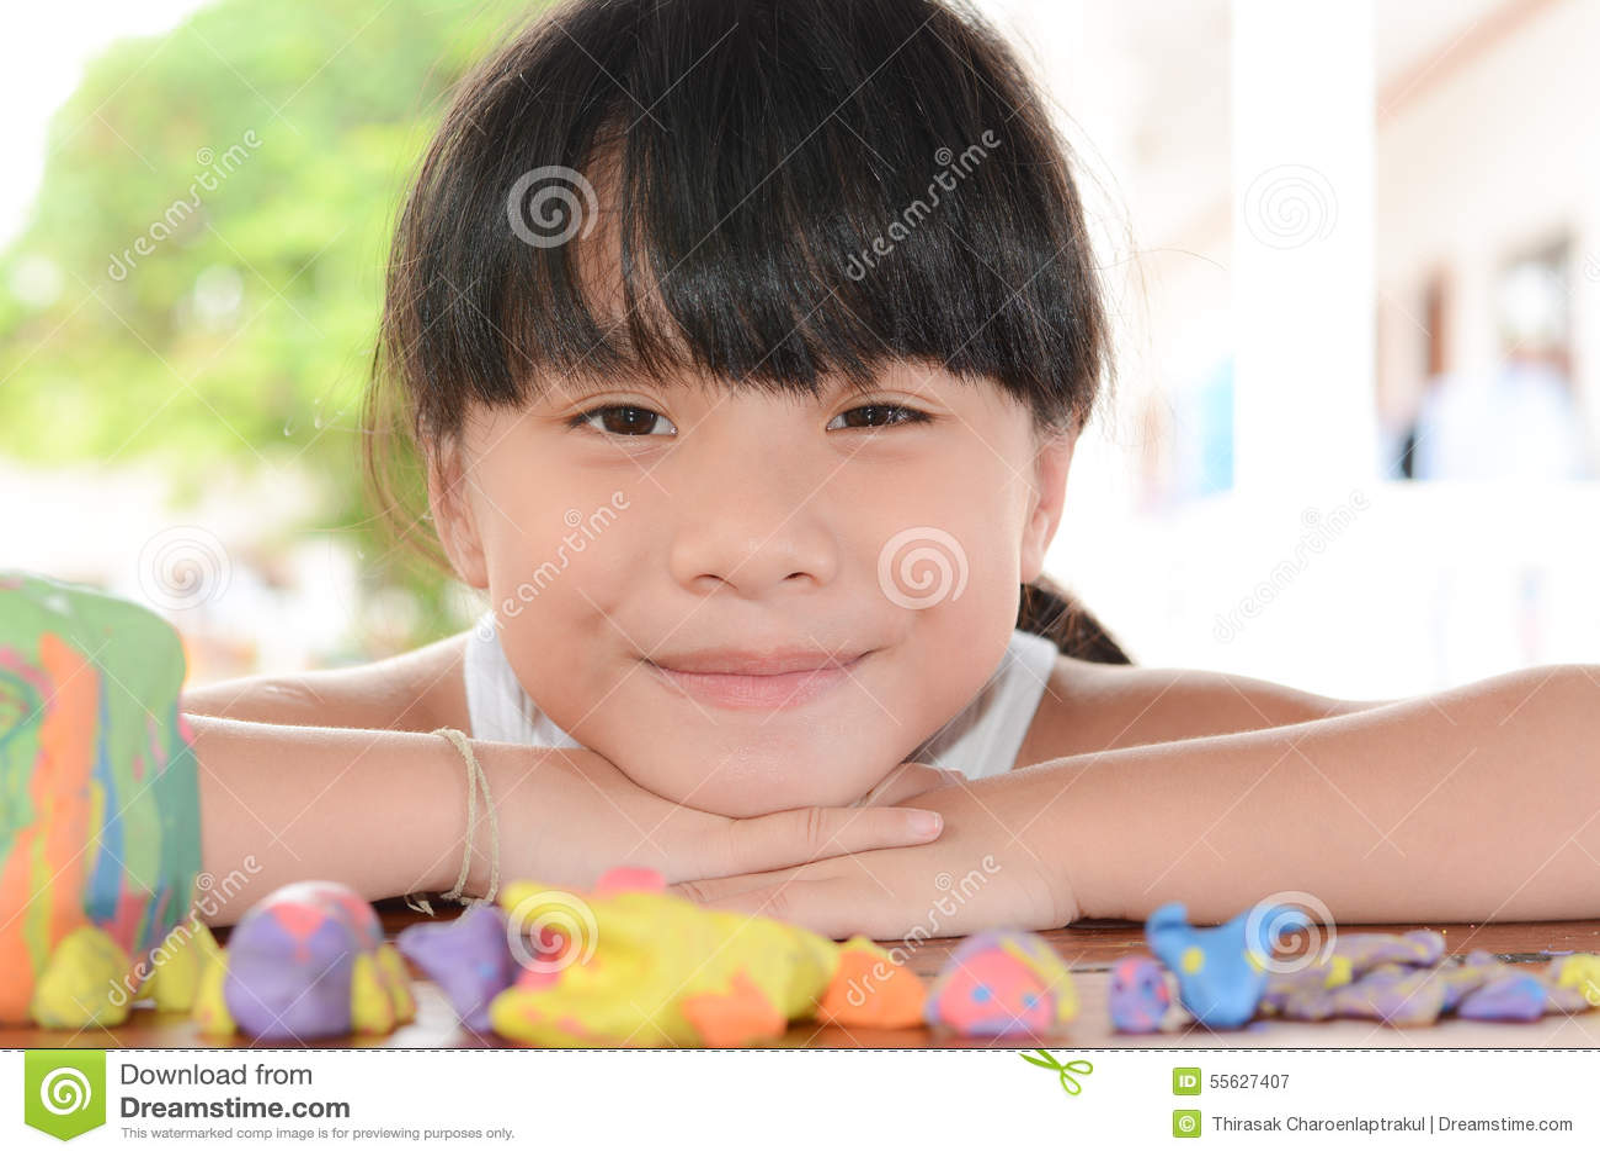 Sorriso dolce dei bambini